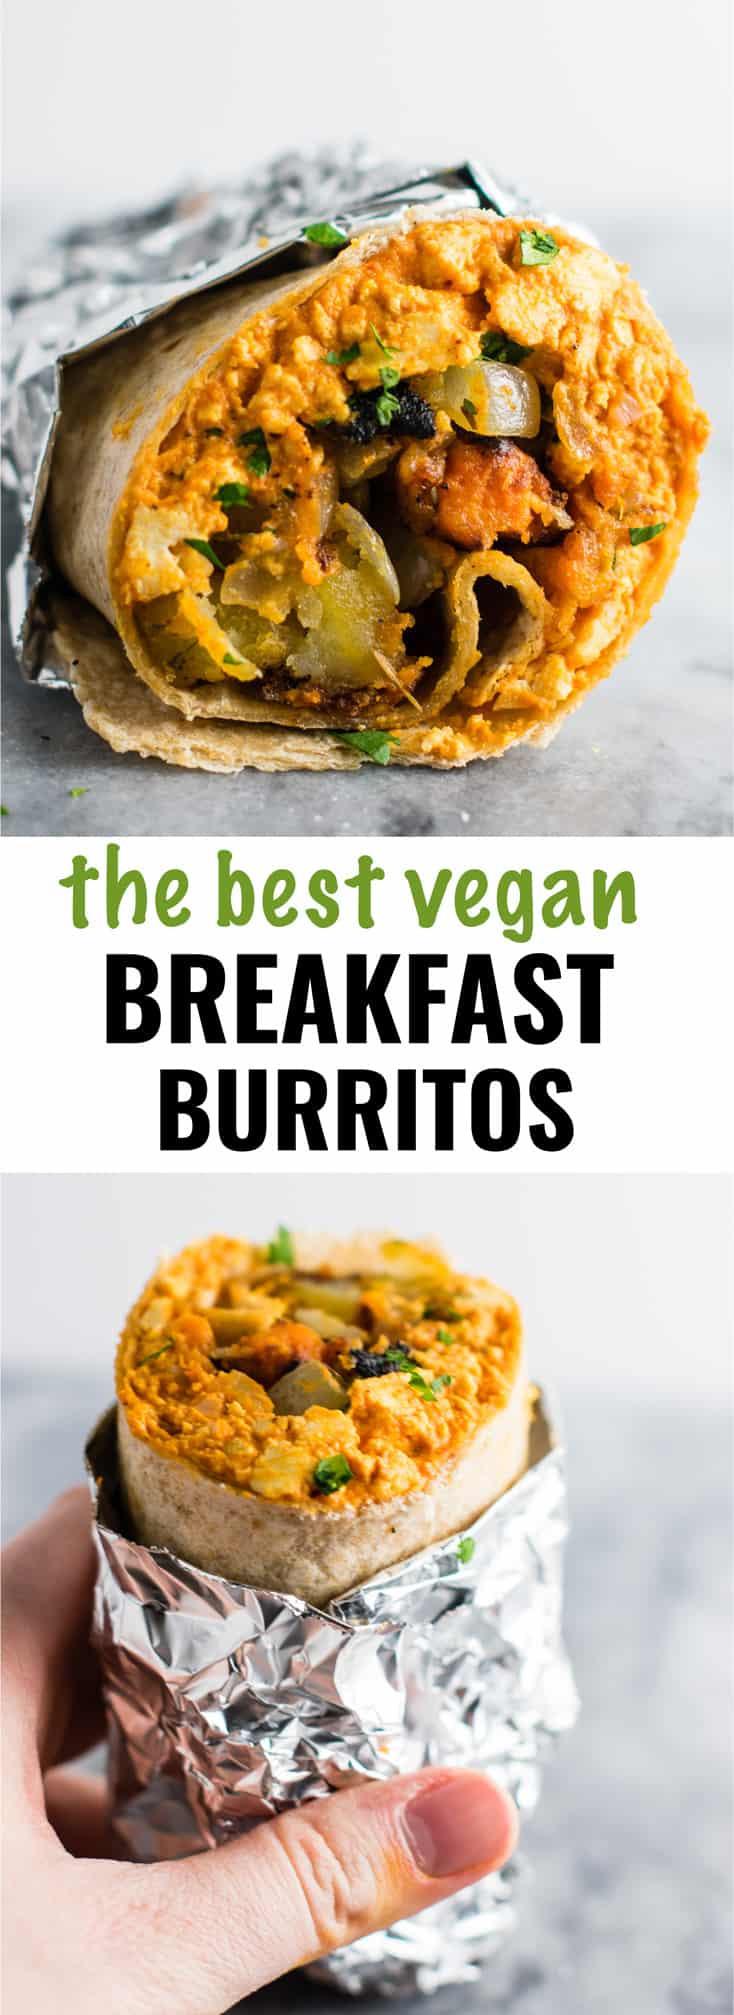 Best Vegan Breakfast Recipes  Vegan Breakfast Burrito Recipe with scrambled tofu and